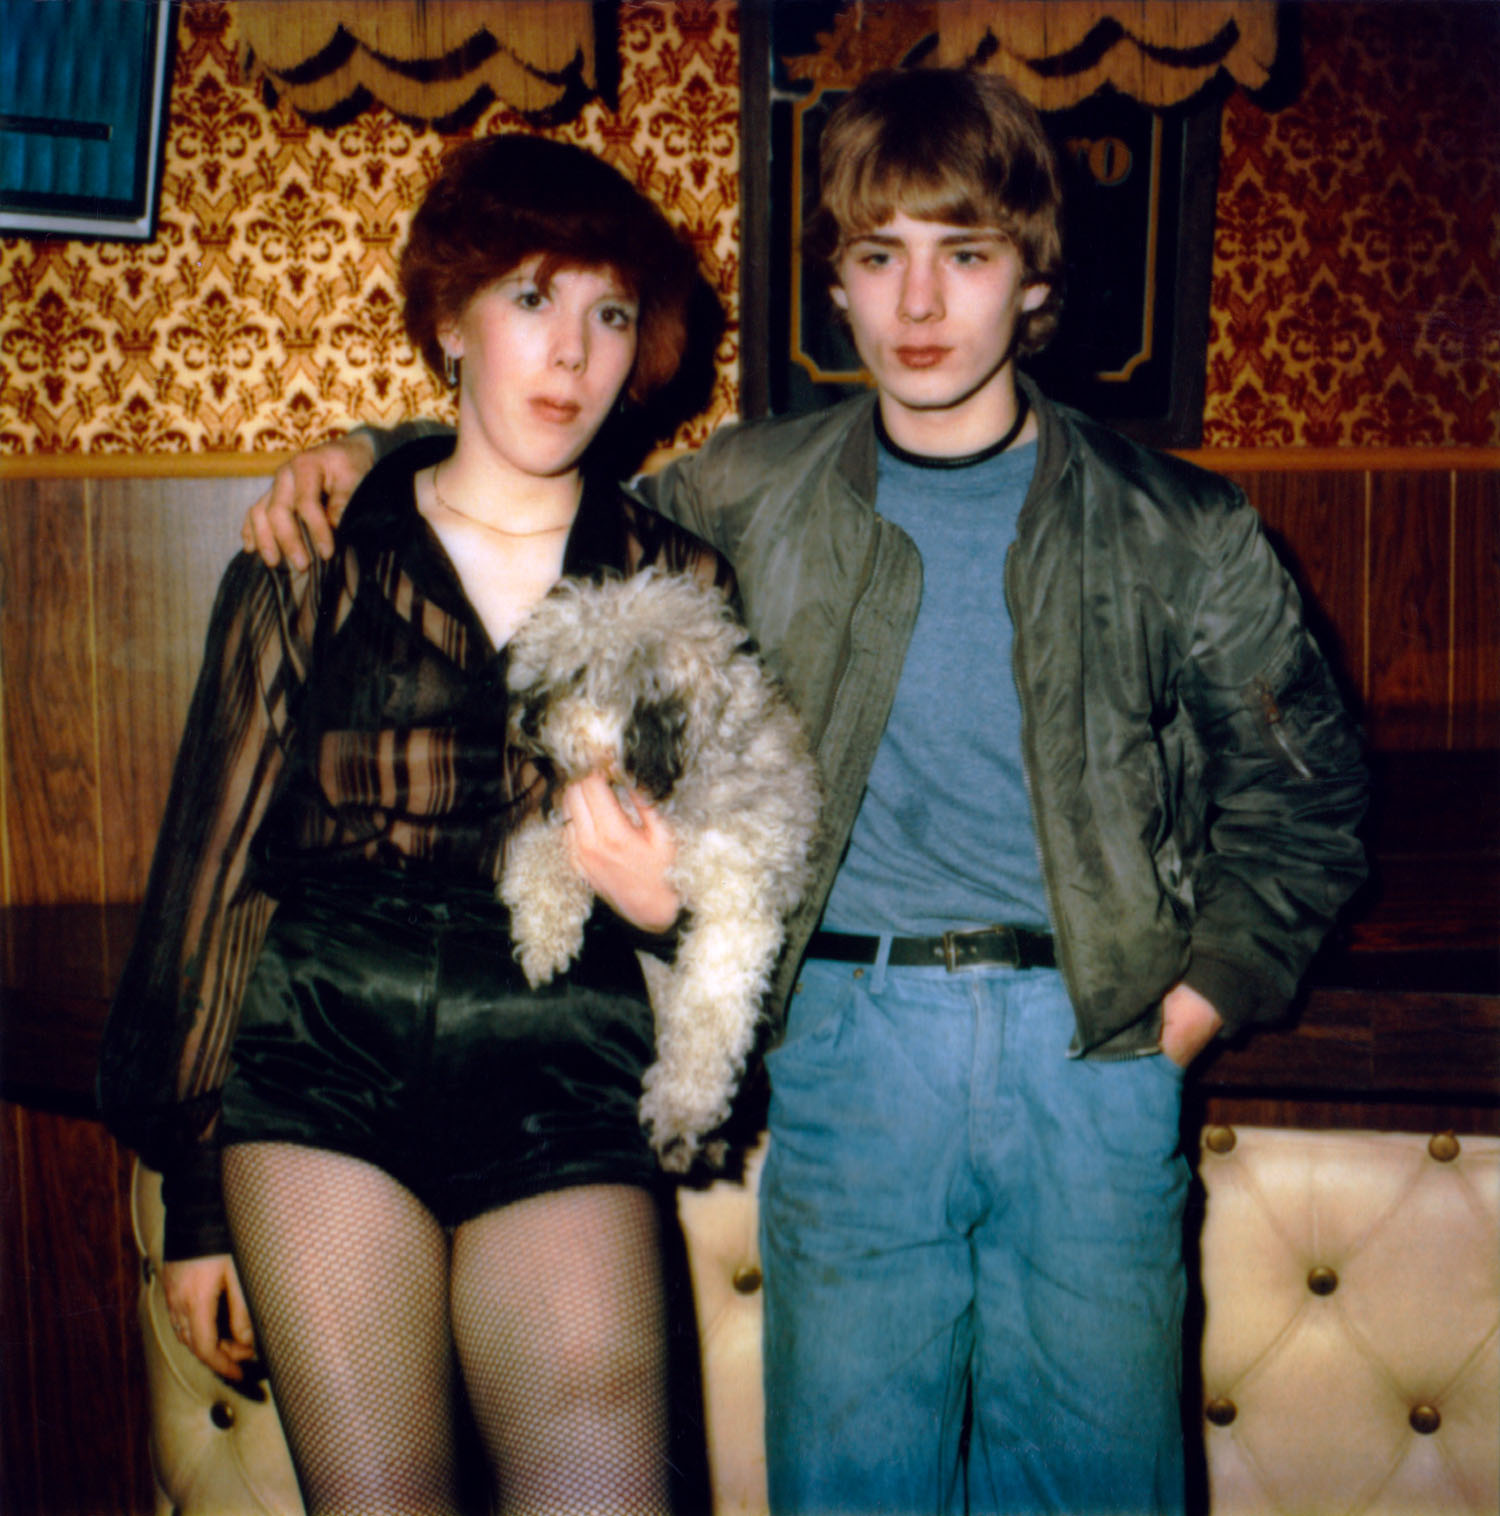 Sister and brother at Café de Waag